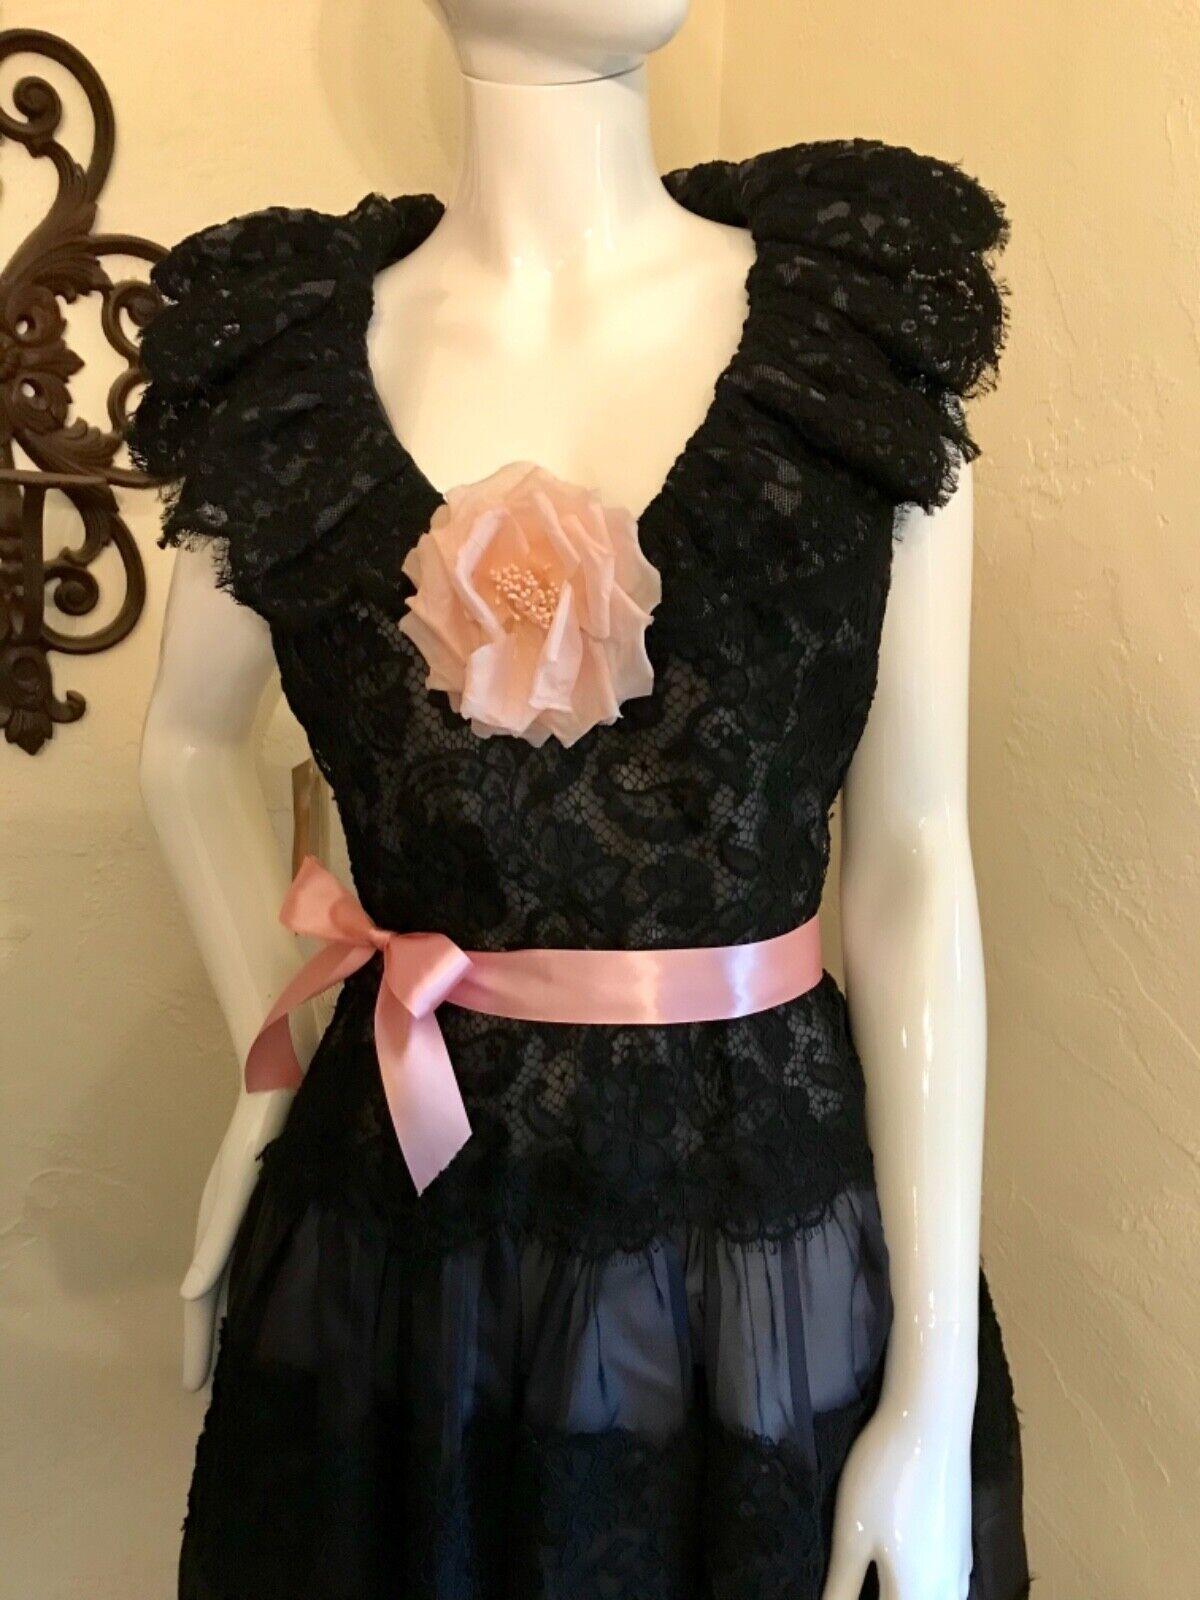 VINTAGE 1980's SCAASI BOUTIQUE Black Lace Cocktai… - image 3